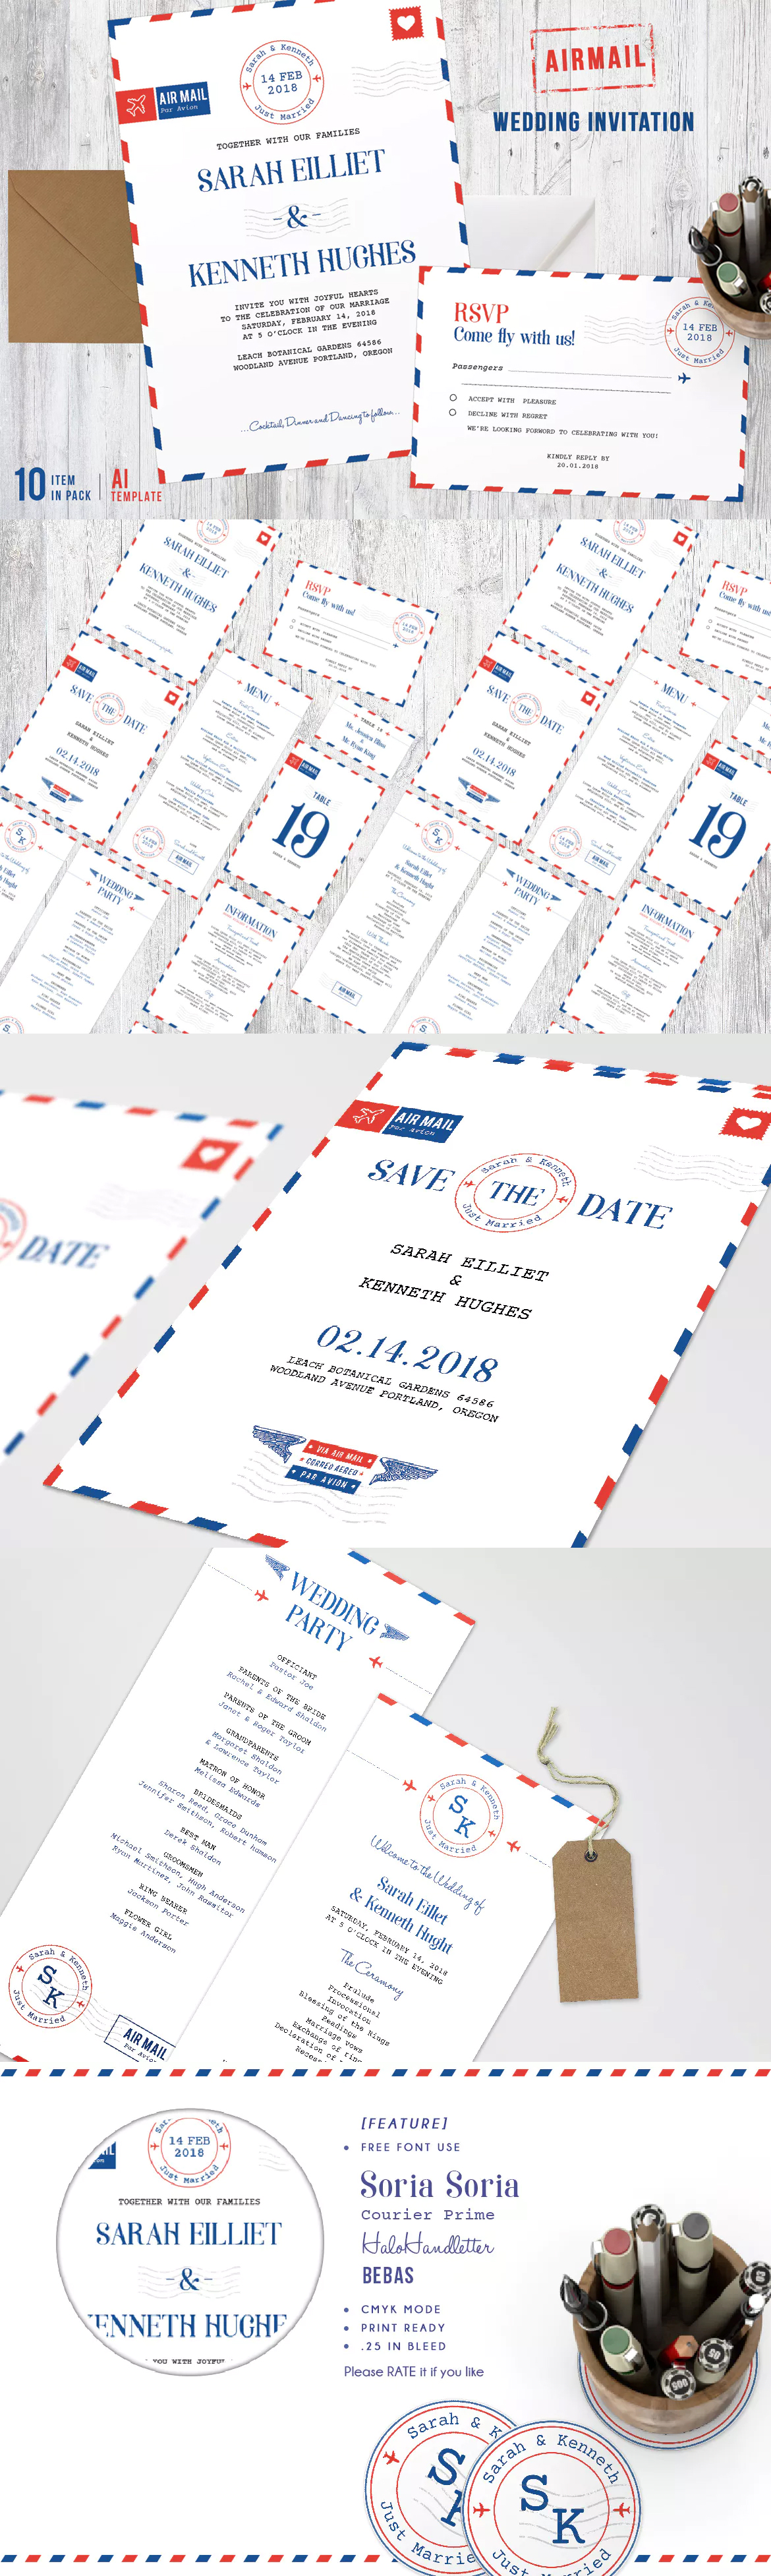 Airmail Wedding Invitations Template AI EPS